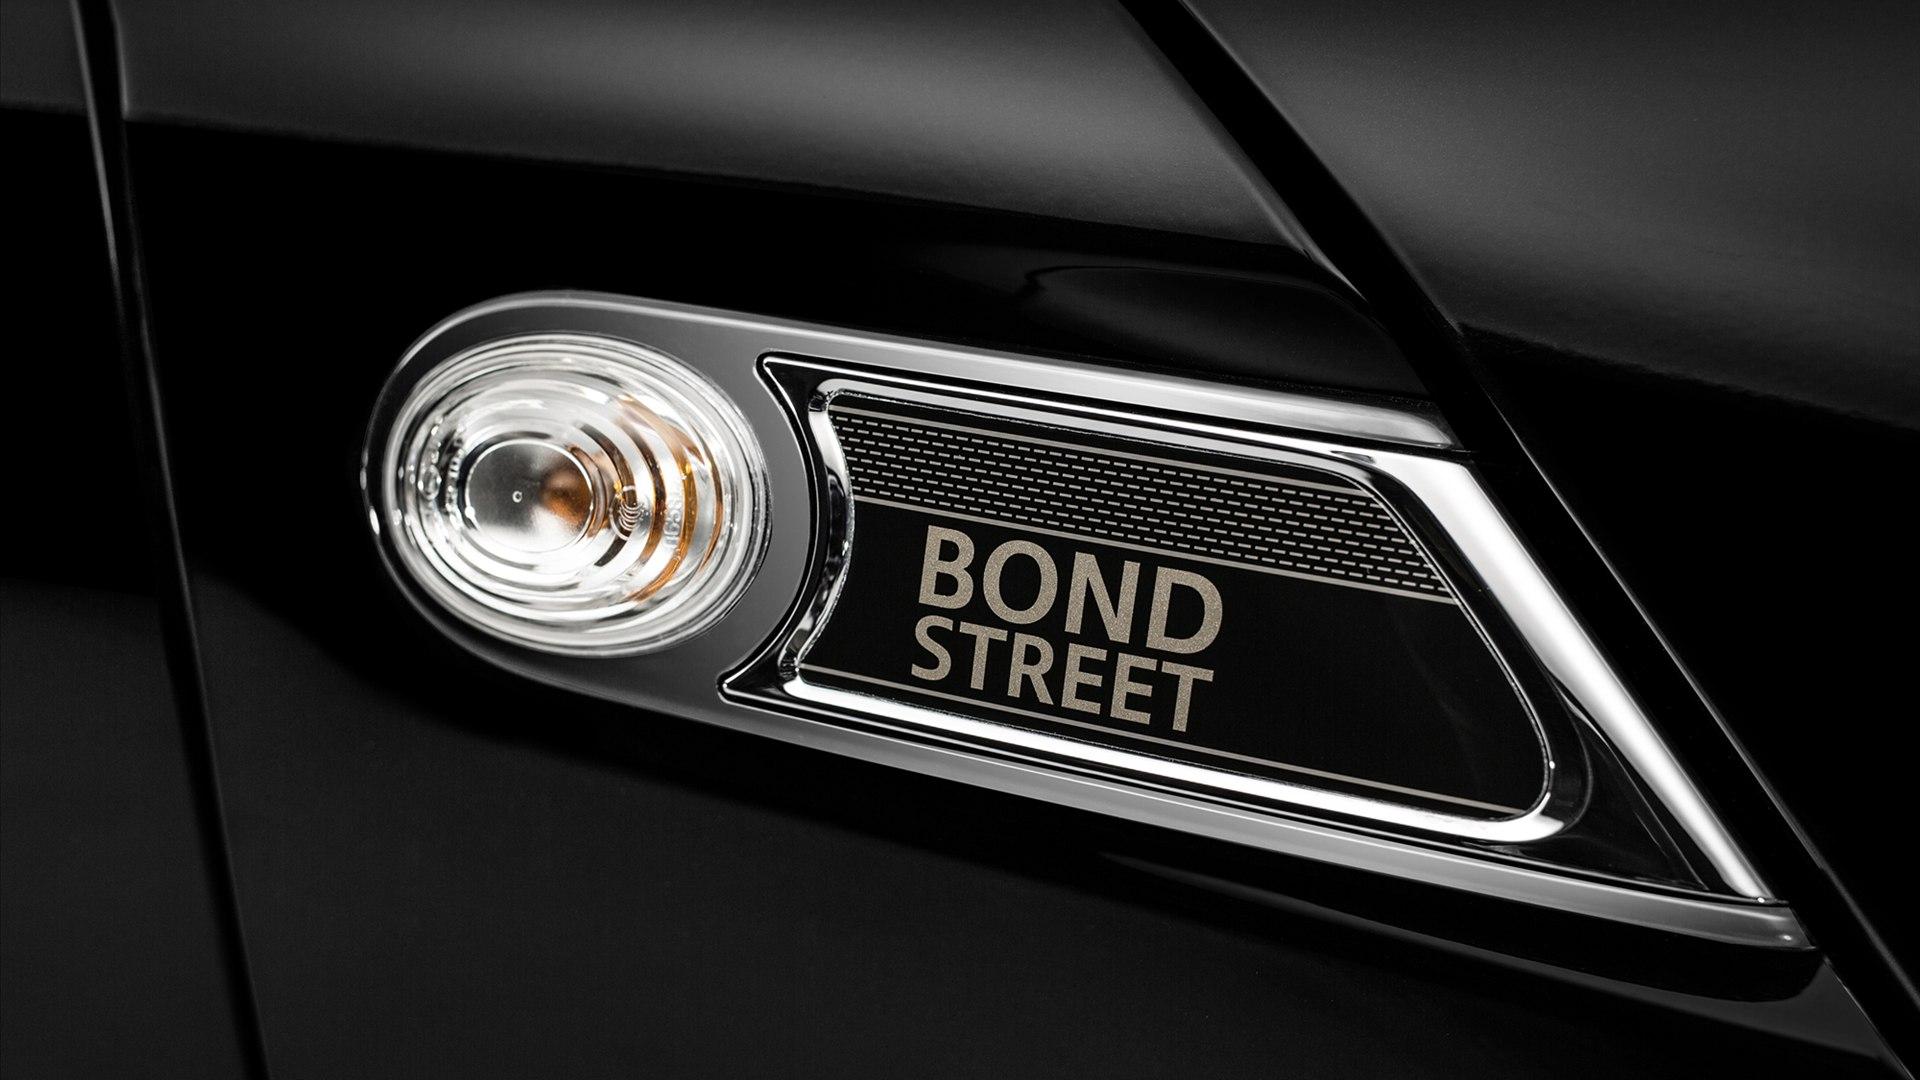 Mini Cooper S Clubman Bond Street 2013 обои для рабочего стола